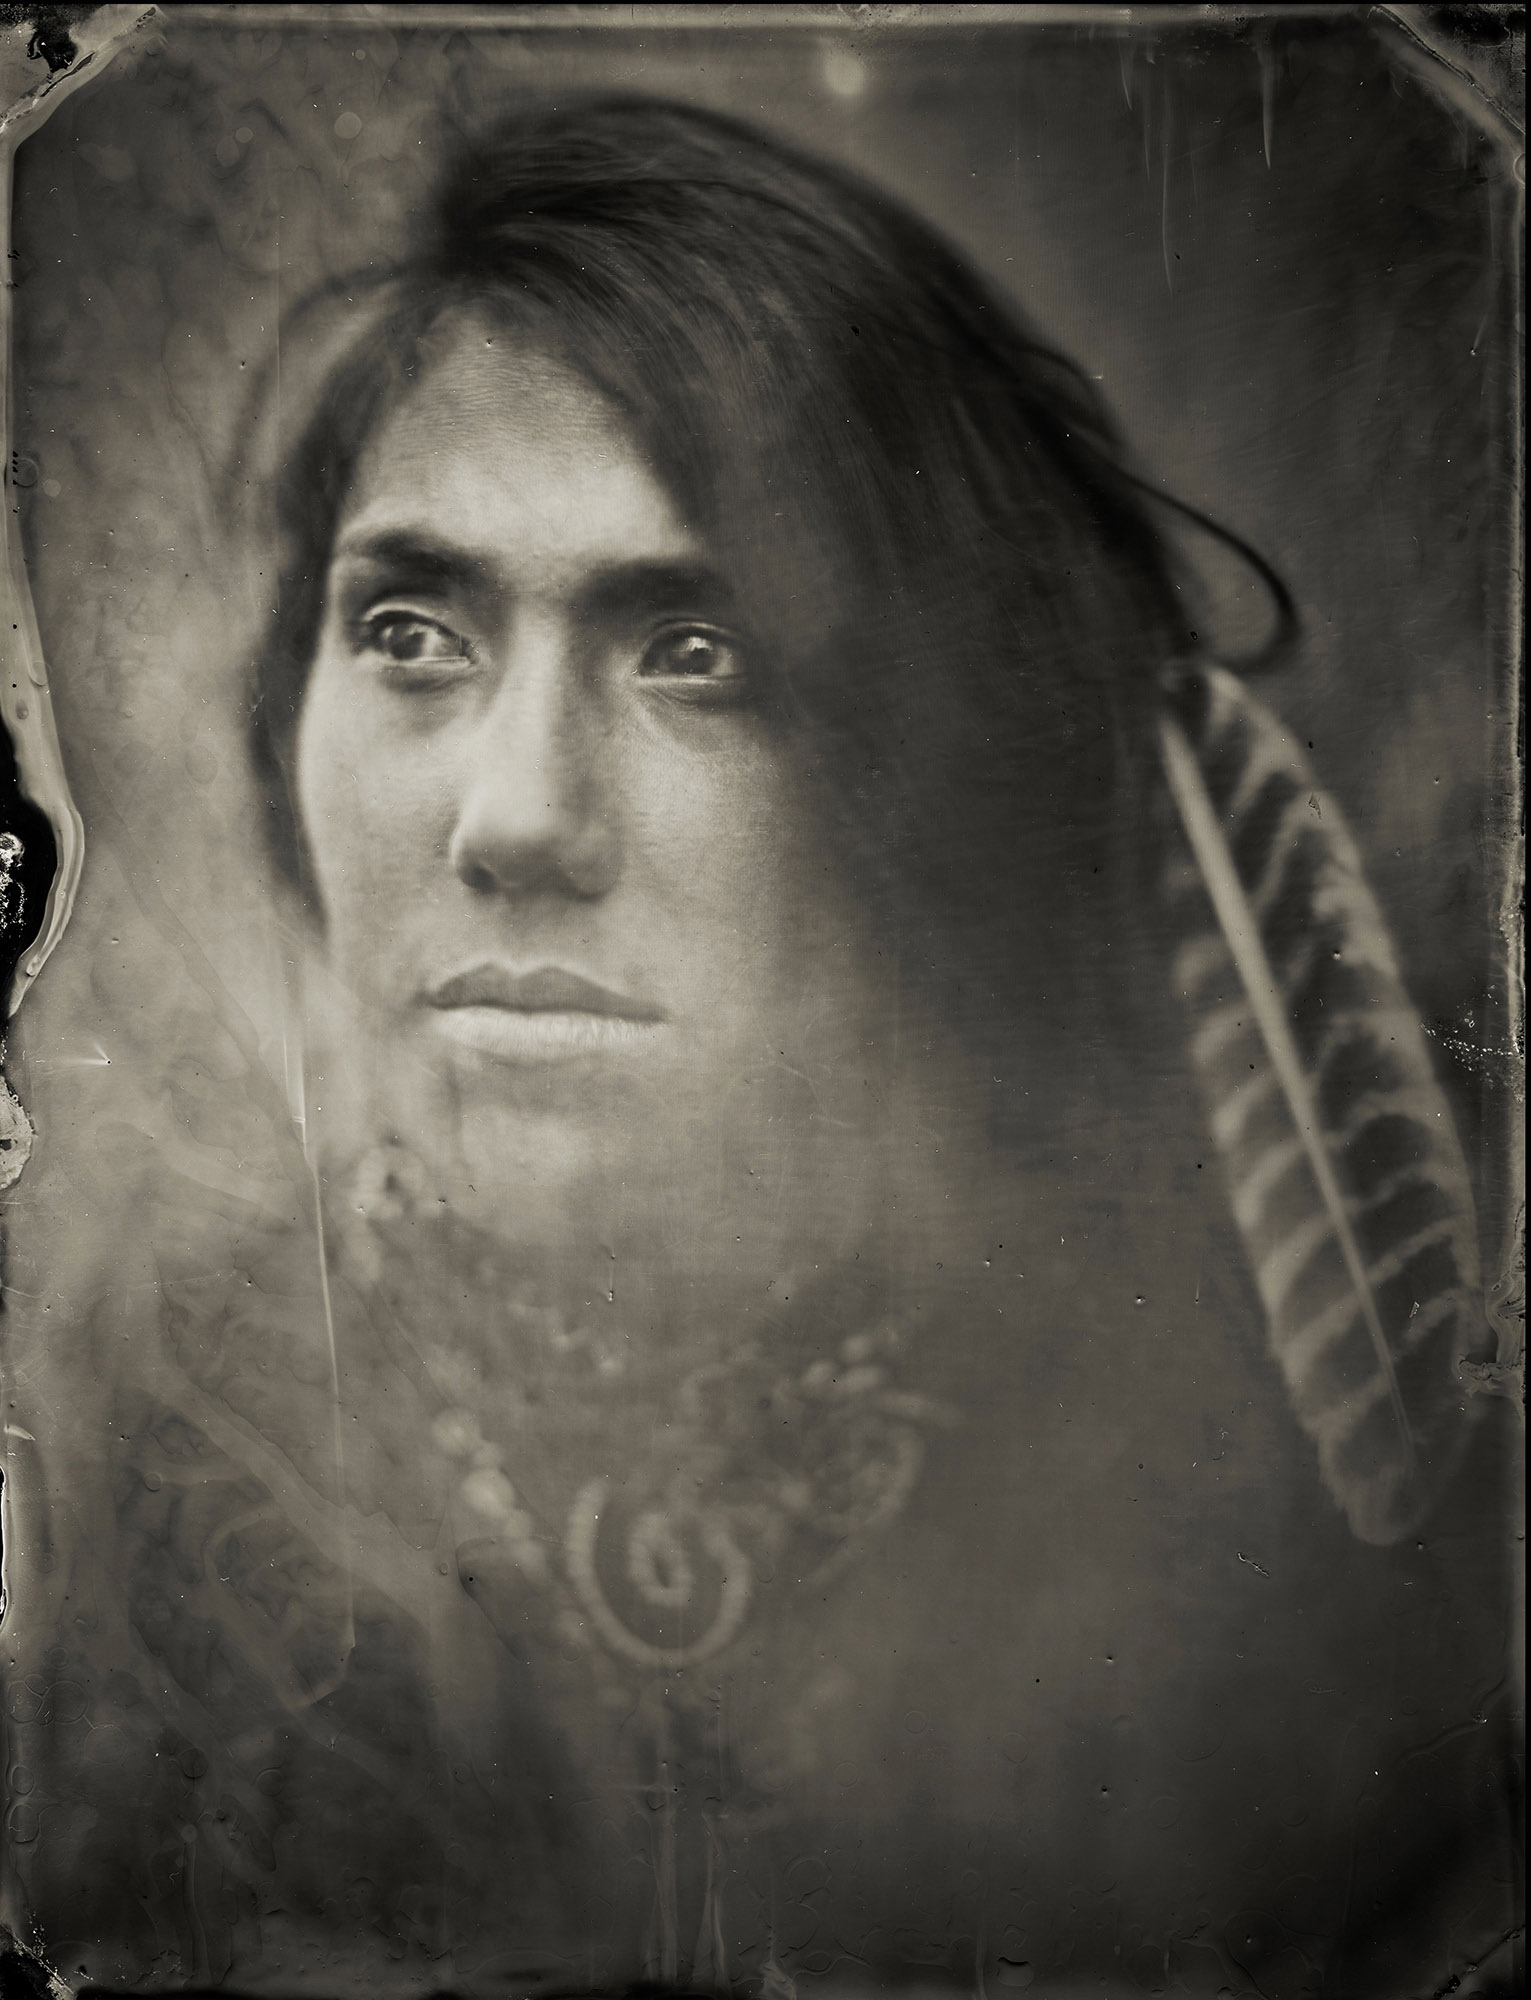 Rhea, Water Protector, Standing Rock - By:Angel Colmenares  chemicalangel.com